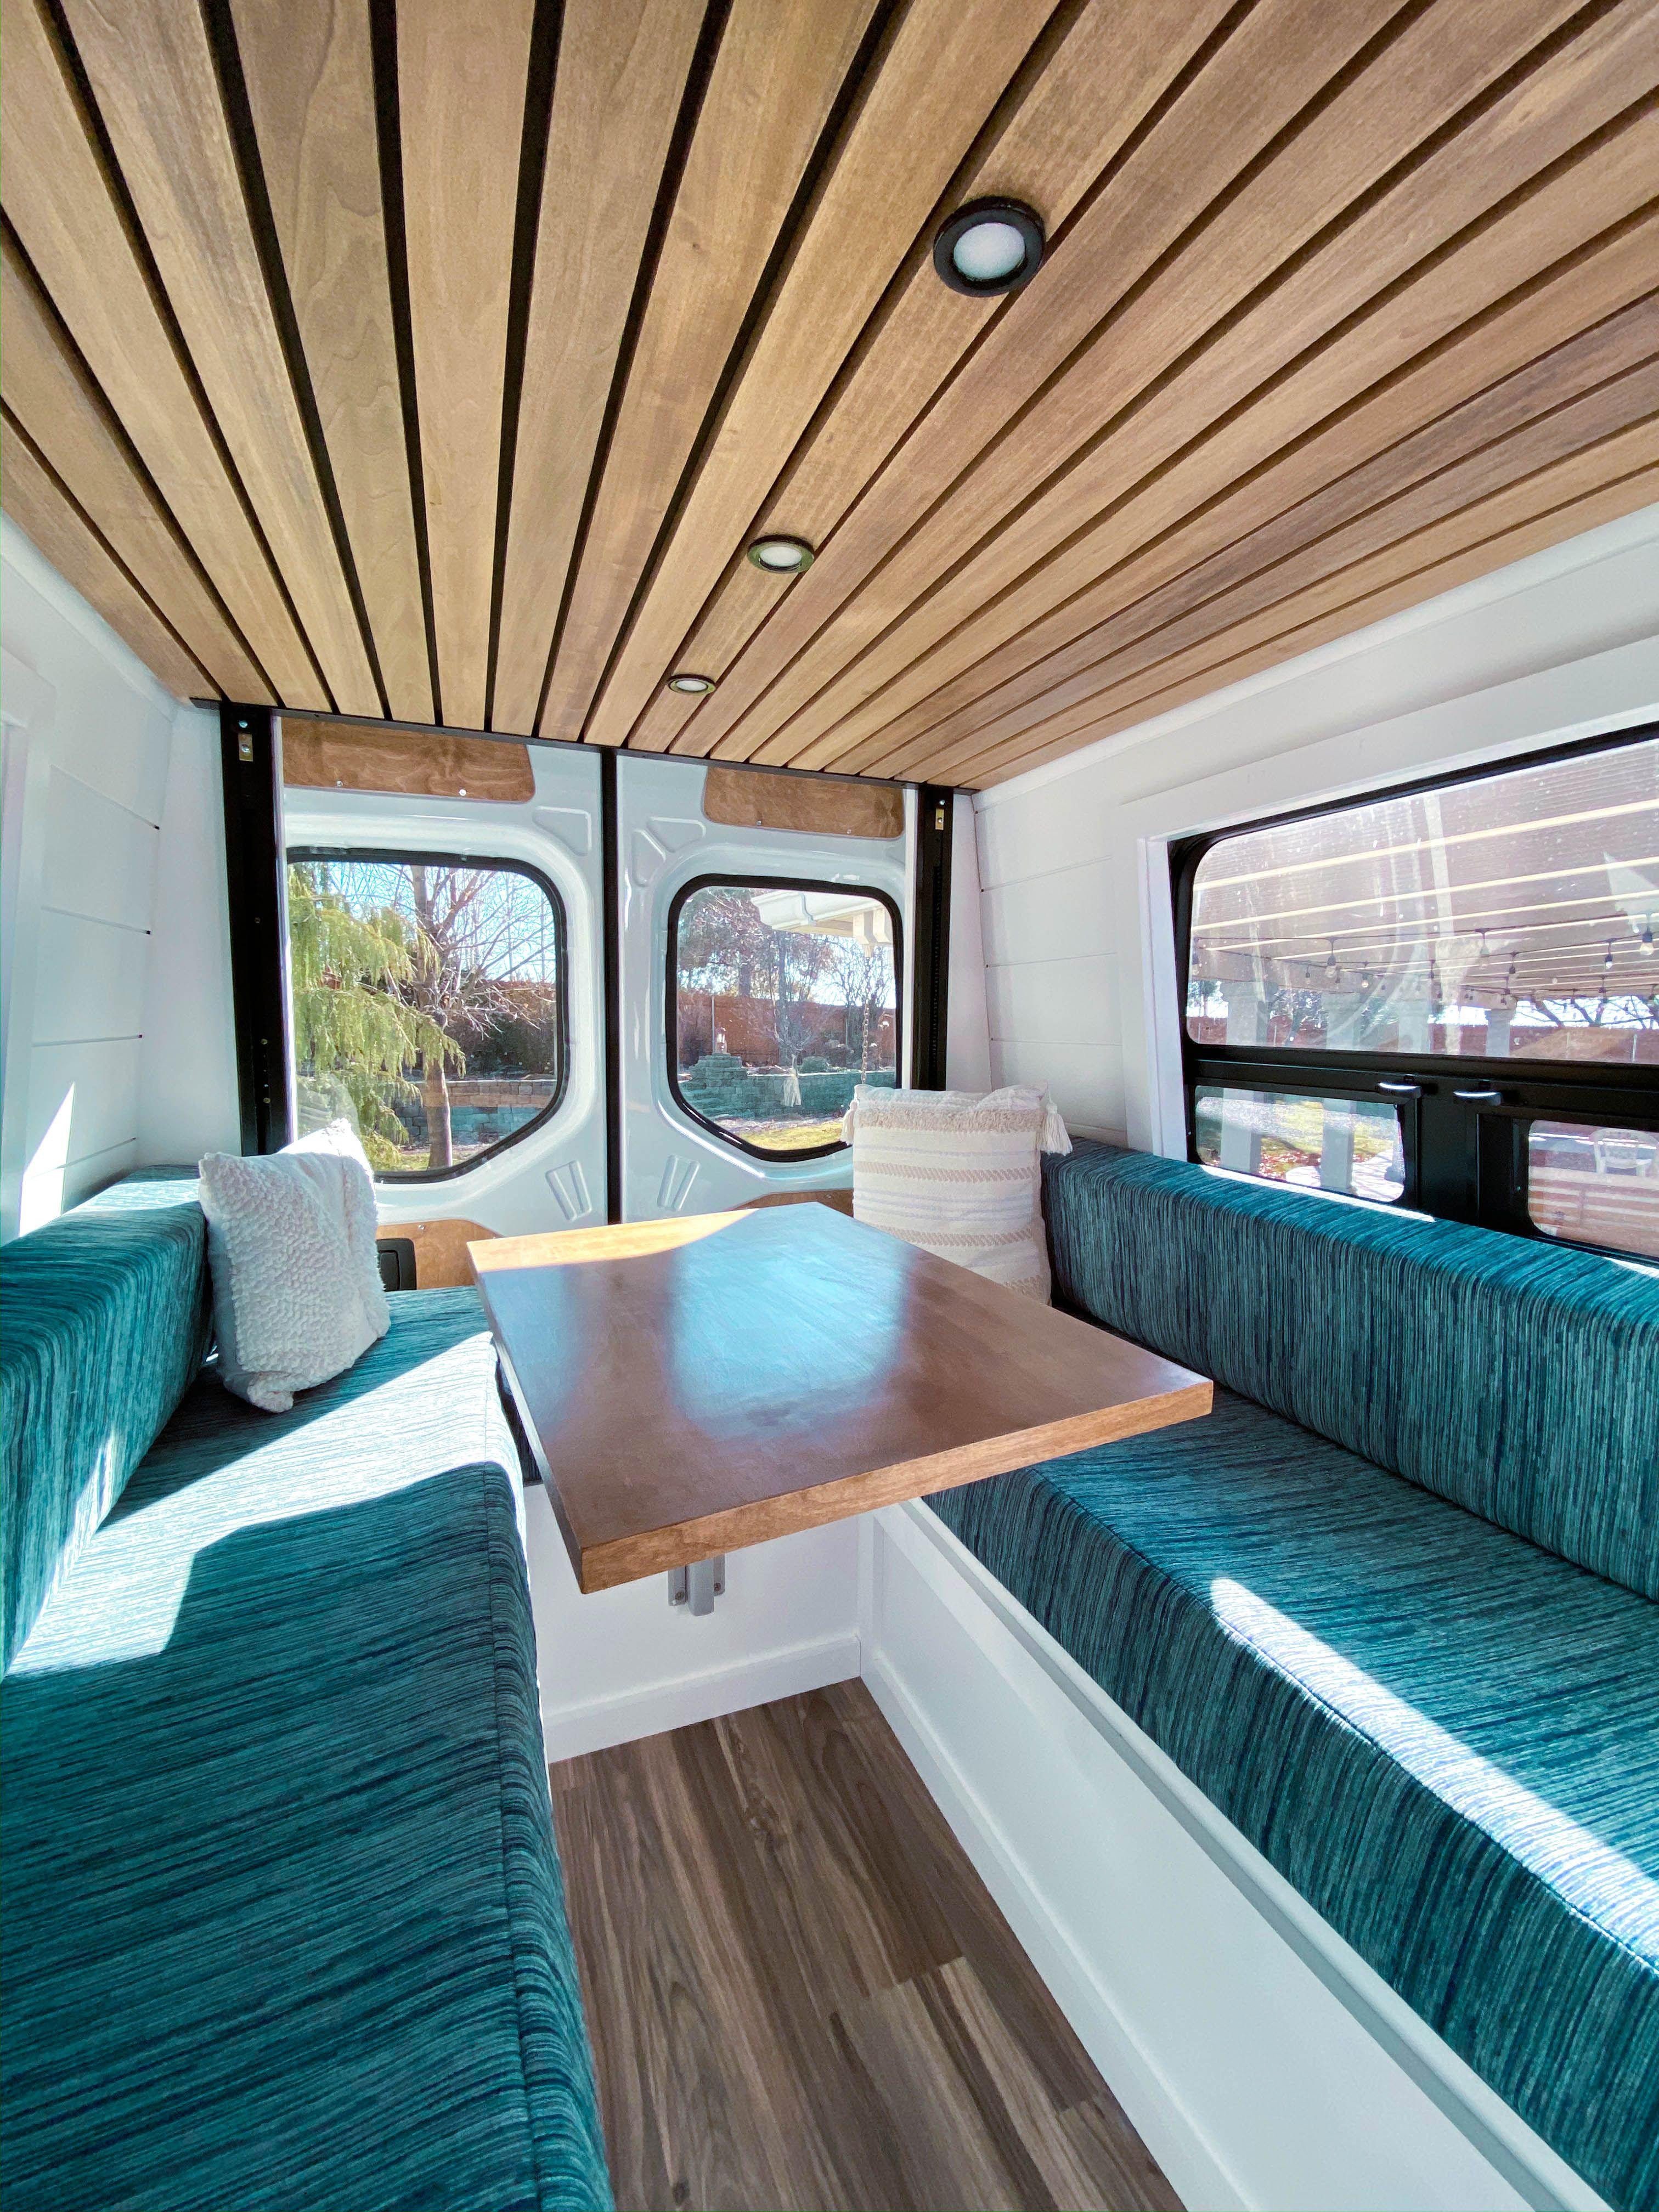 FAMILY VAN TOUR Van home, Sprinter van conversion, House